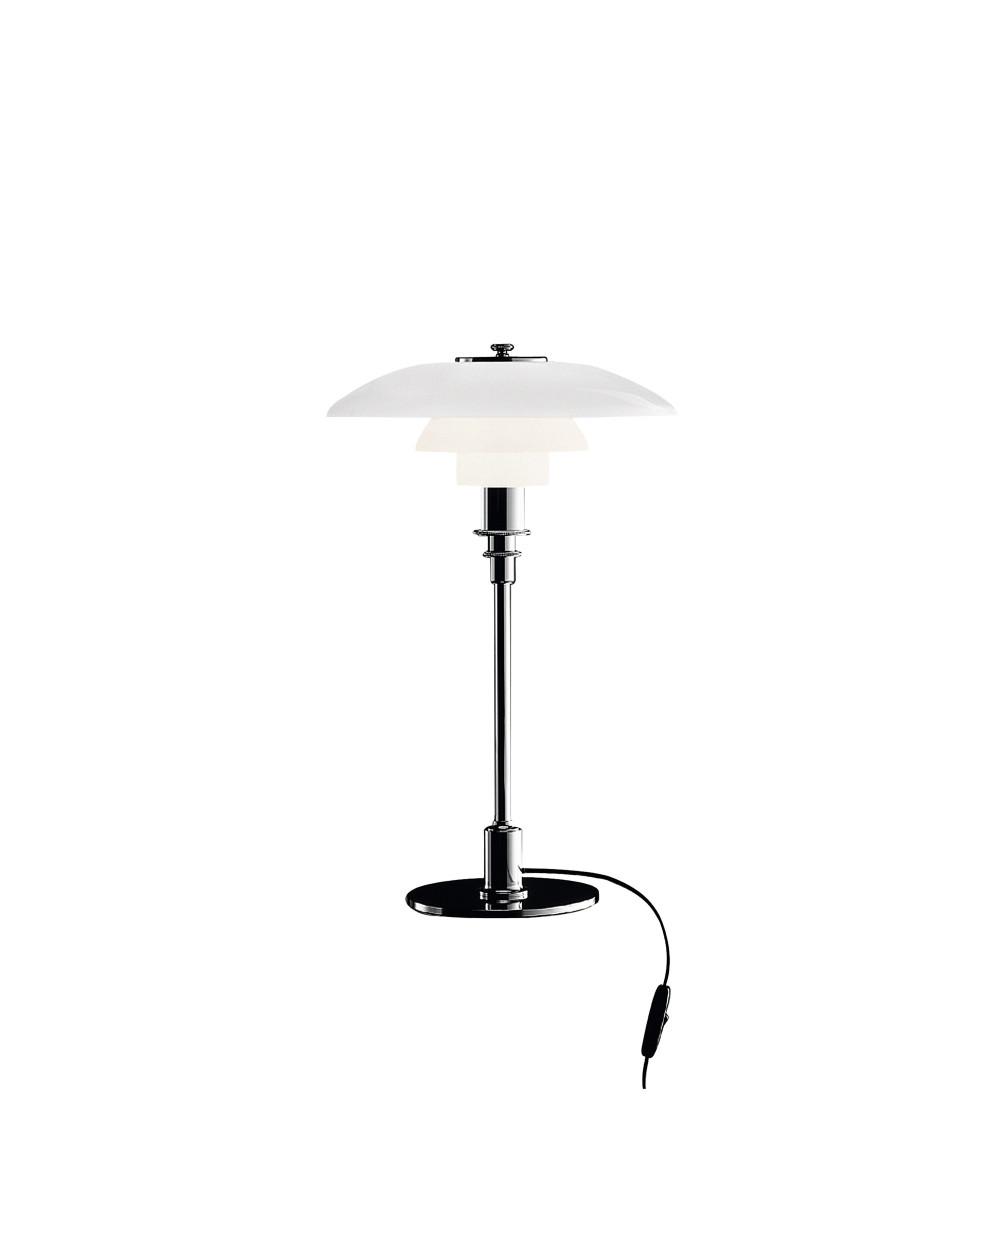 PH 3-2 LAMPE DE TABLE